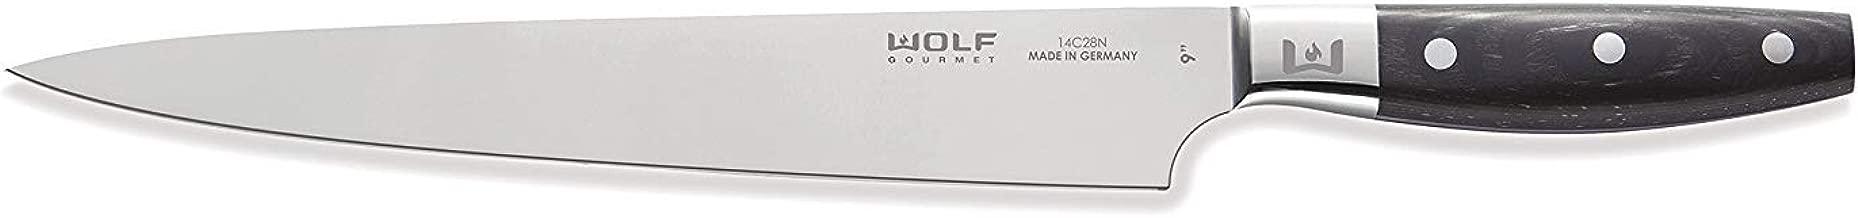 "Wolf Gourmet WGCU179S 9"" Carving Knife"